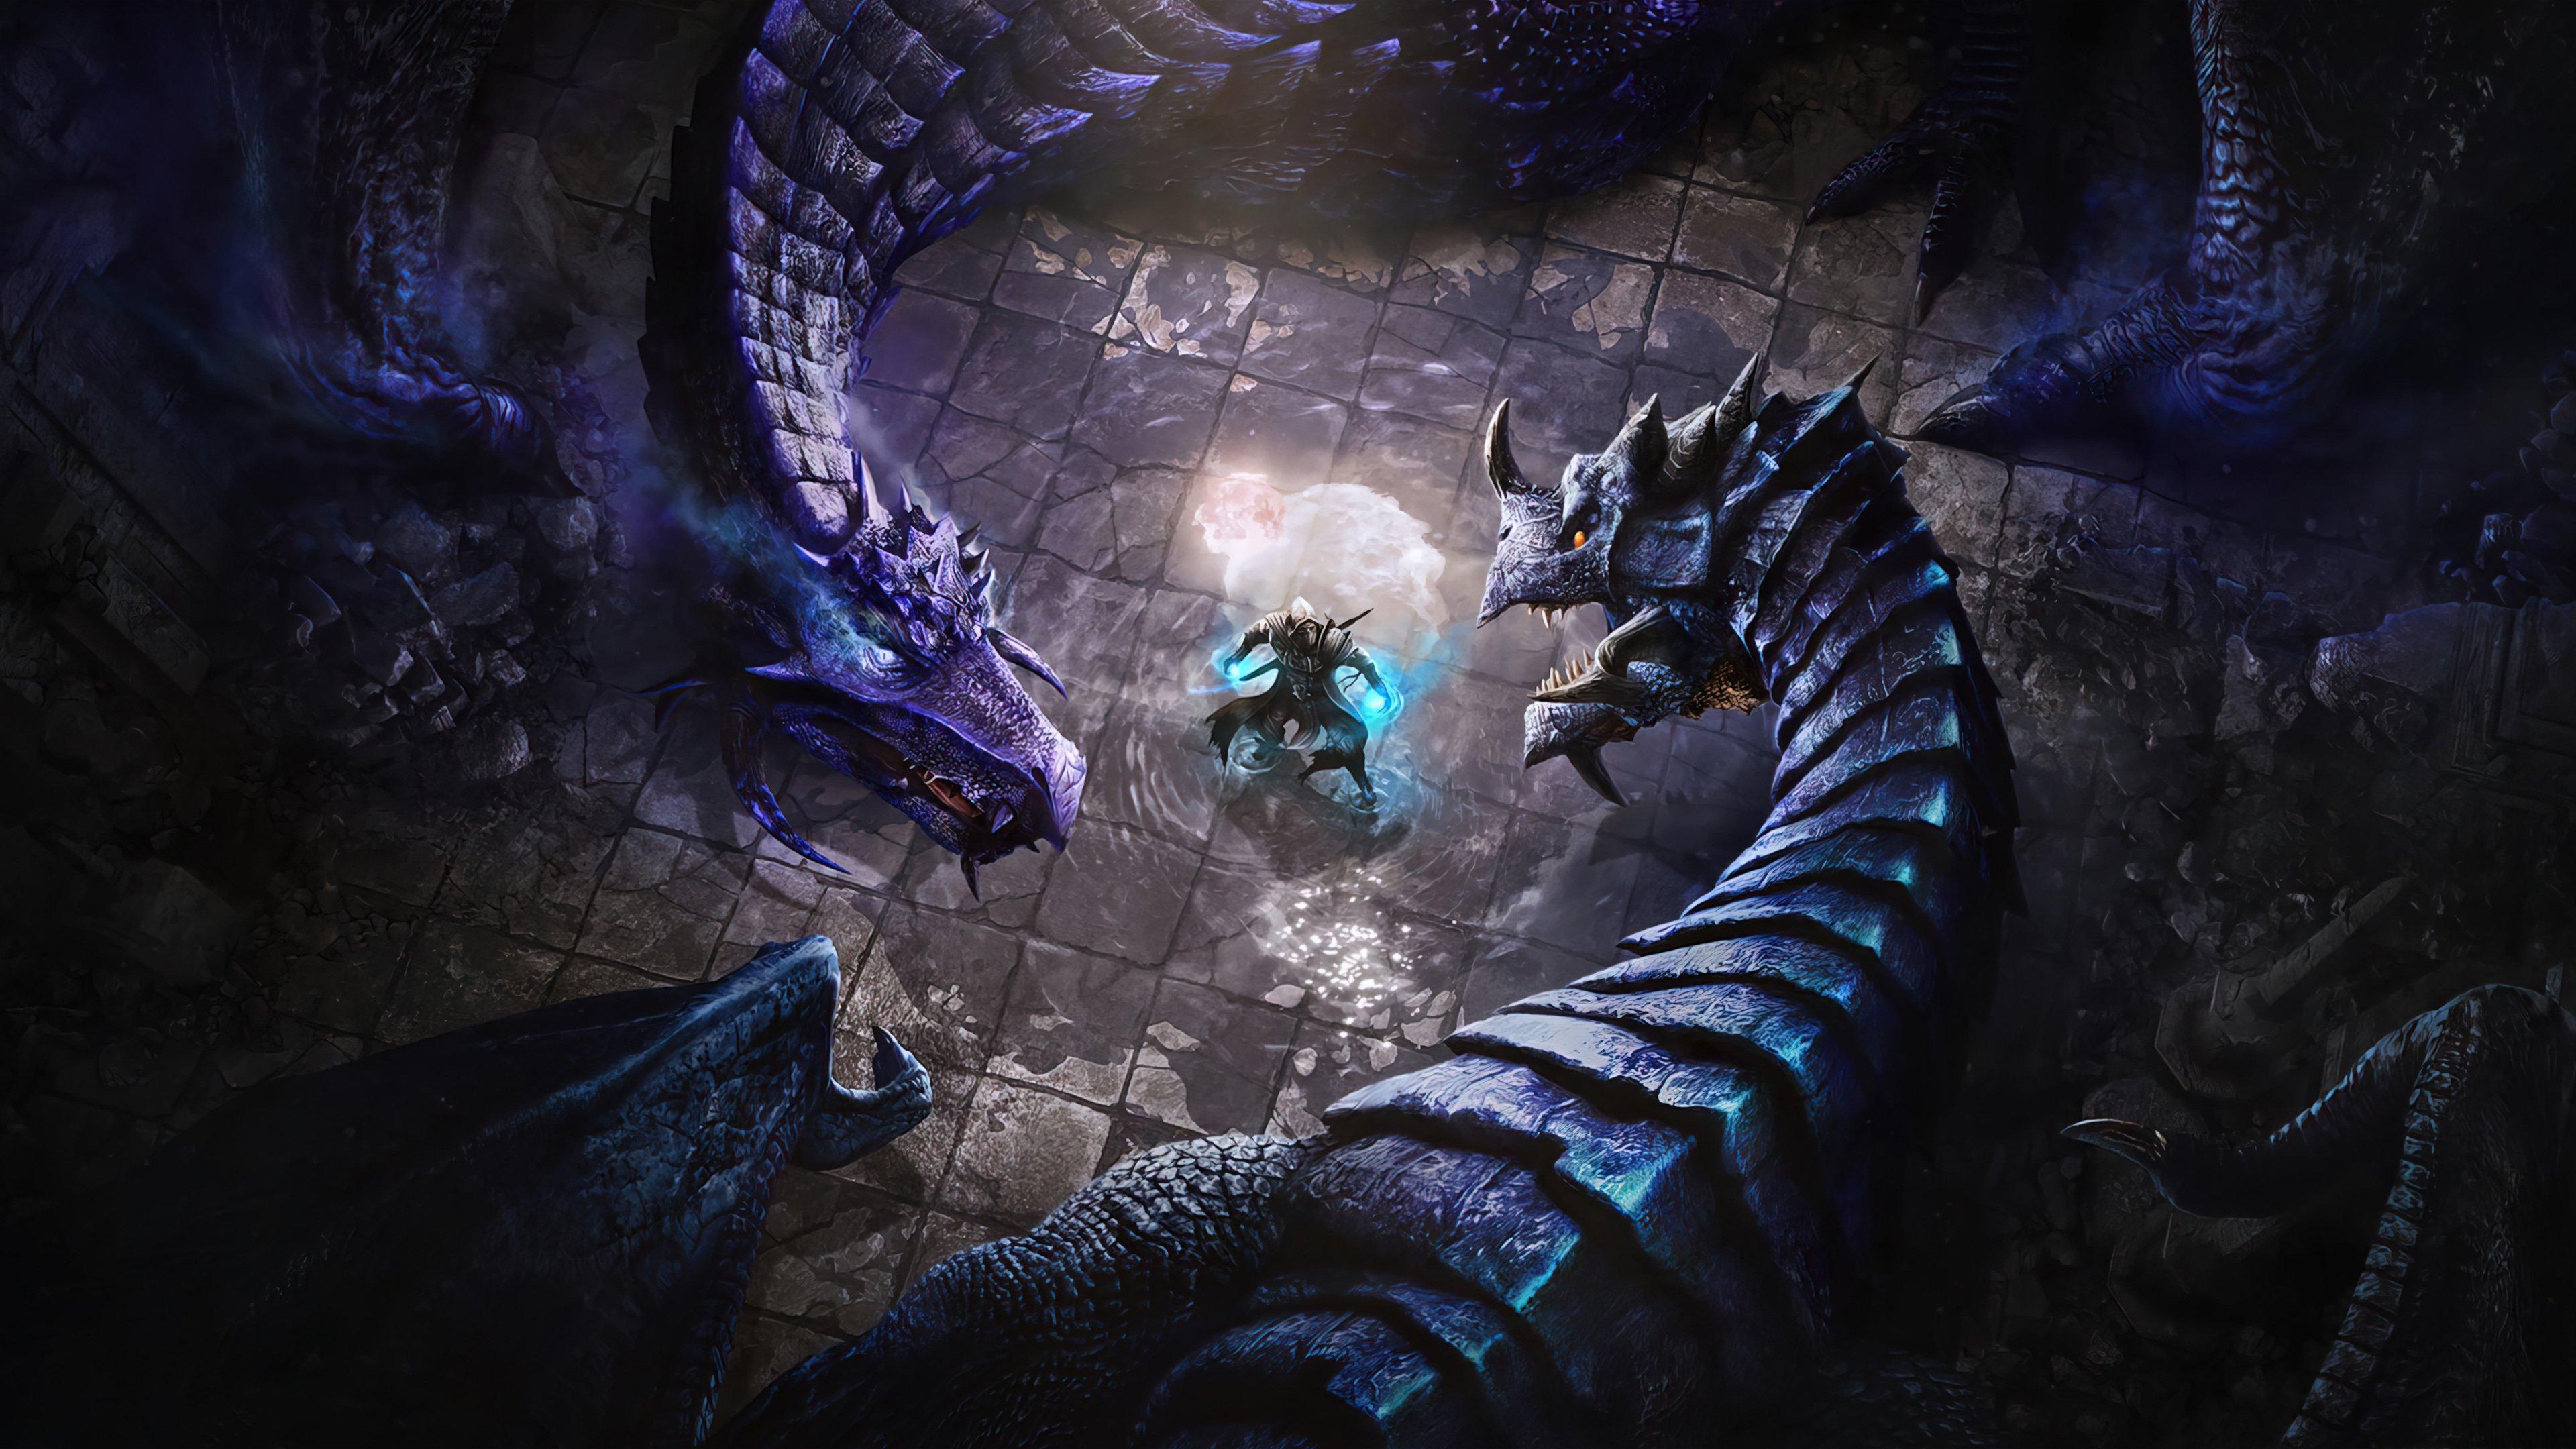 Fondos de pantalla Dragones de The Elder Scrolls Online